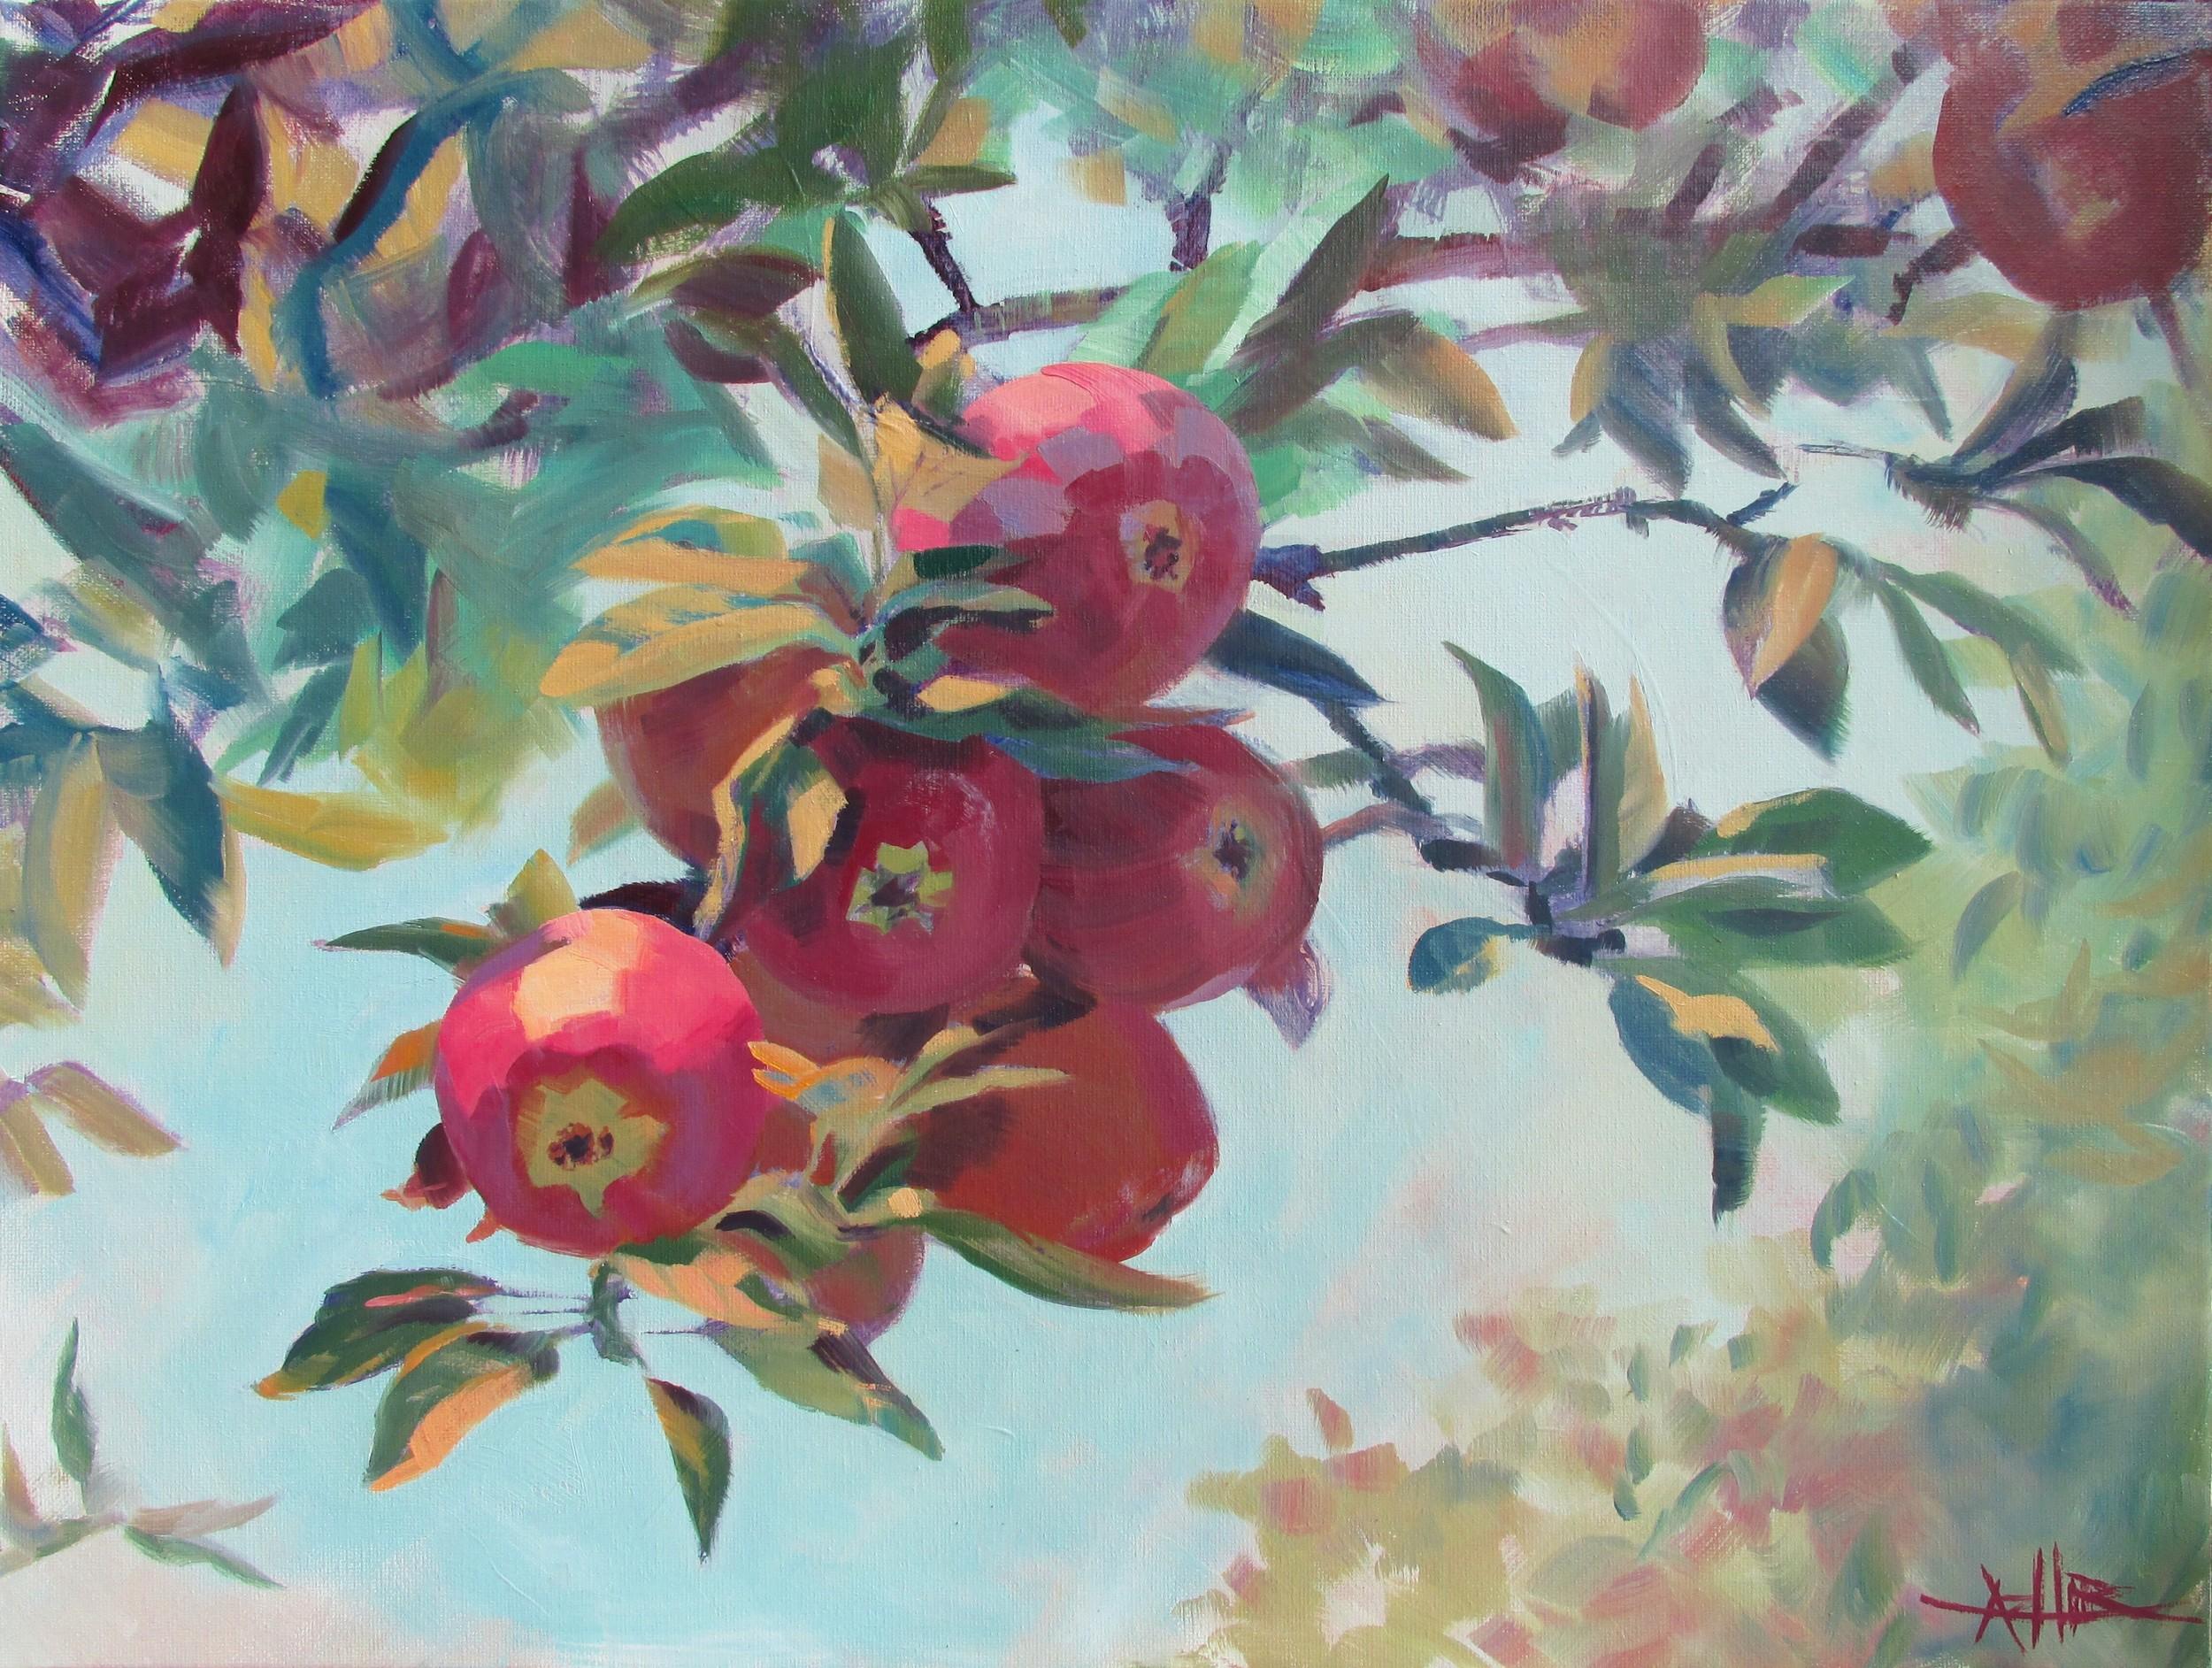 "SOLD, Apples on the Tree, Copyright 2015 Hirschten, Oil on Canvas, 18"" x 24"""